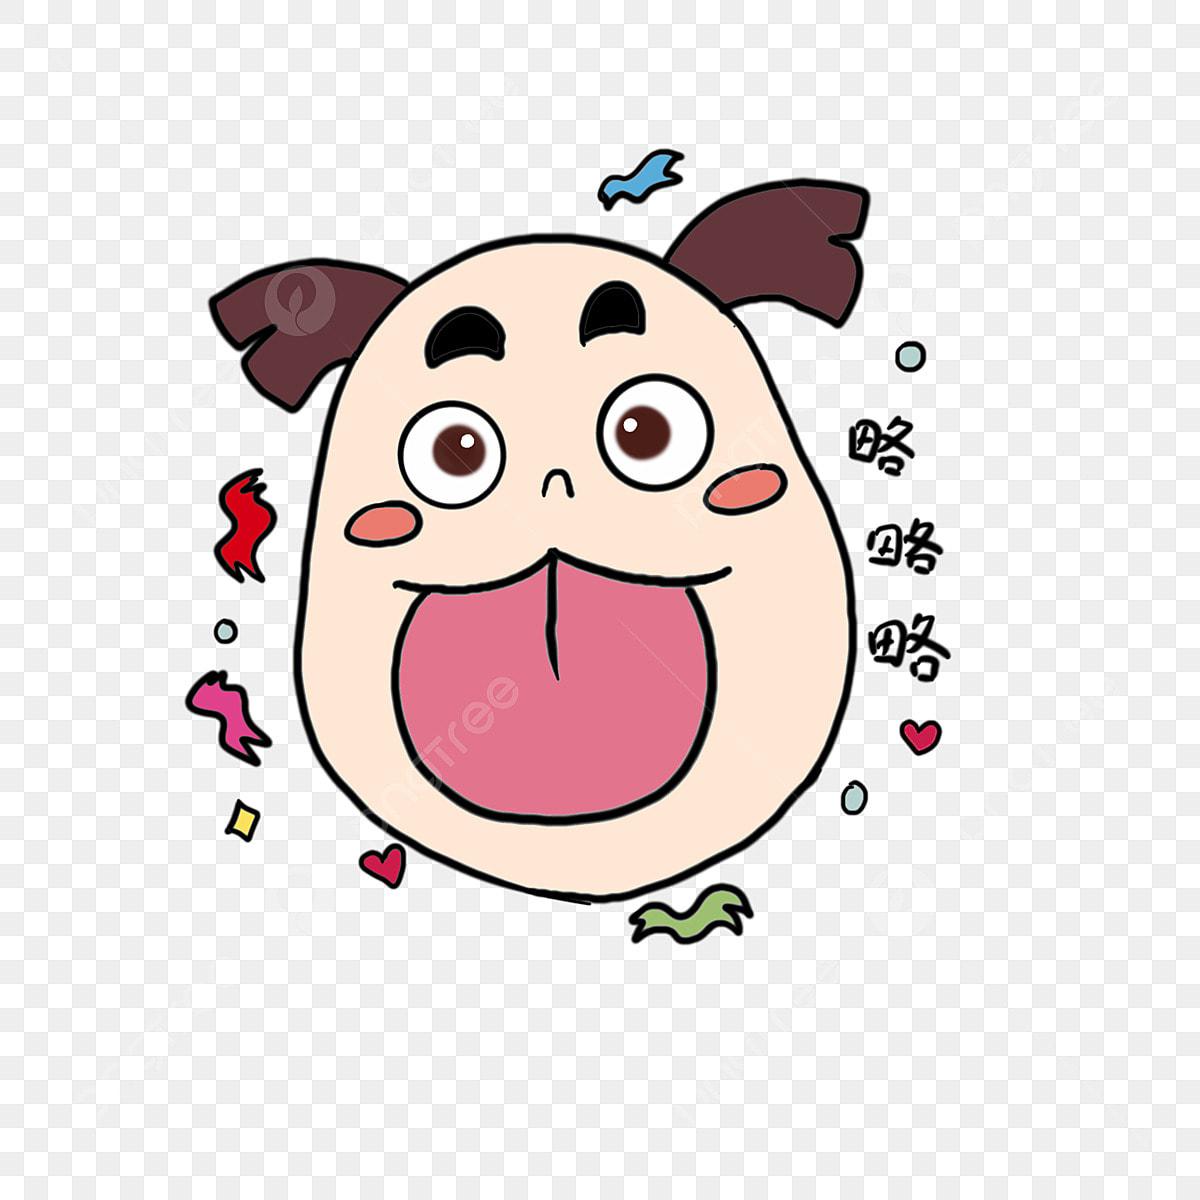 Gambar Smiley Ekspresi Ekspresi Lucu Ungkapan Kartun Lidah Ekspresi Lucu Lucu Png Dan Psd Untuk Muat Turun Percuma